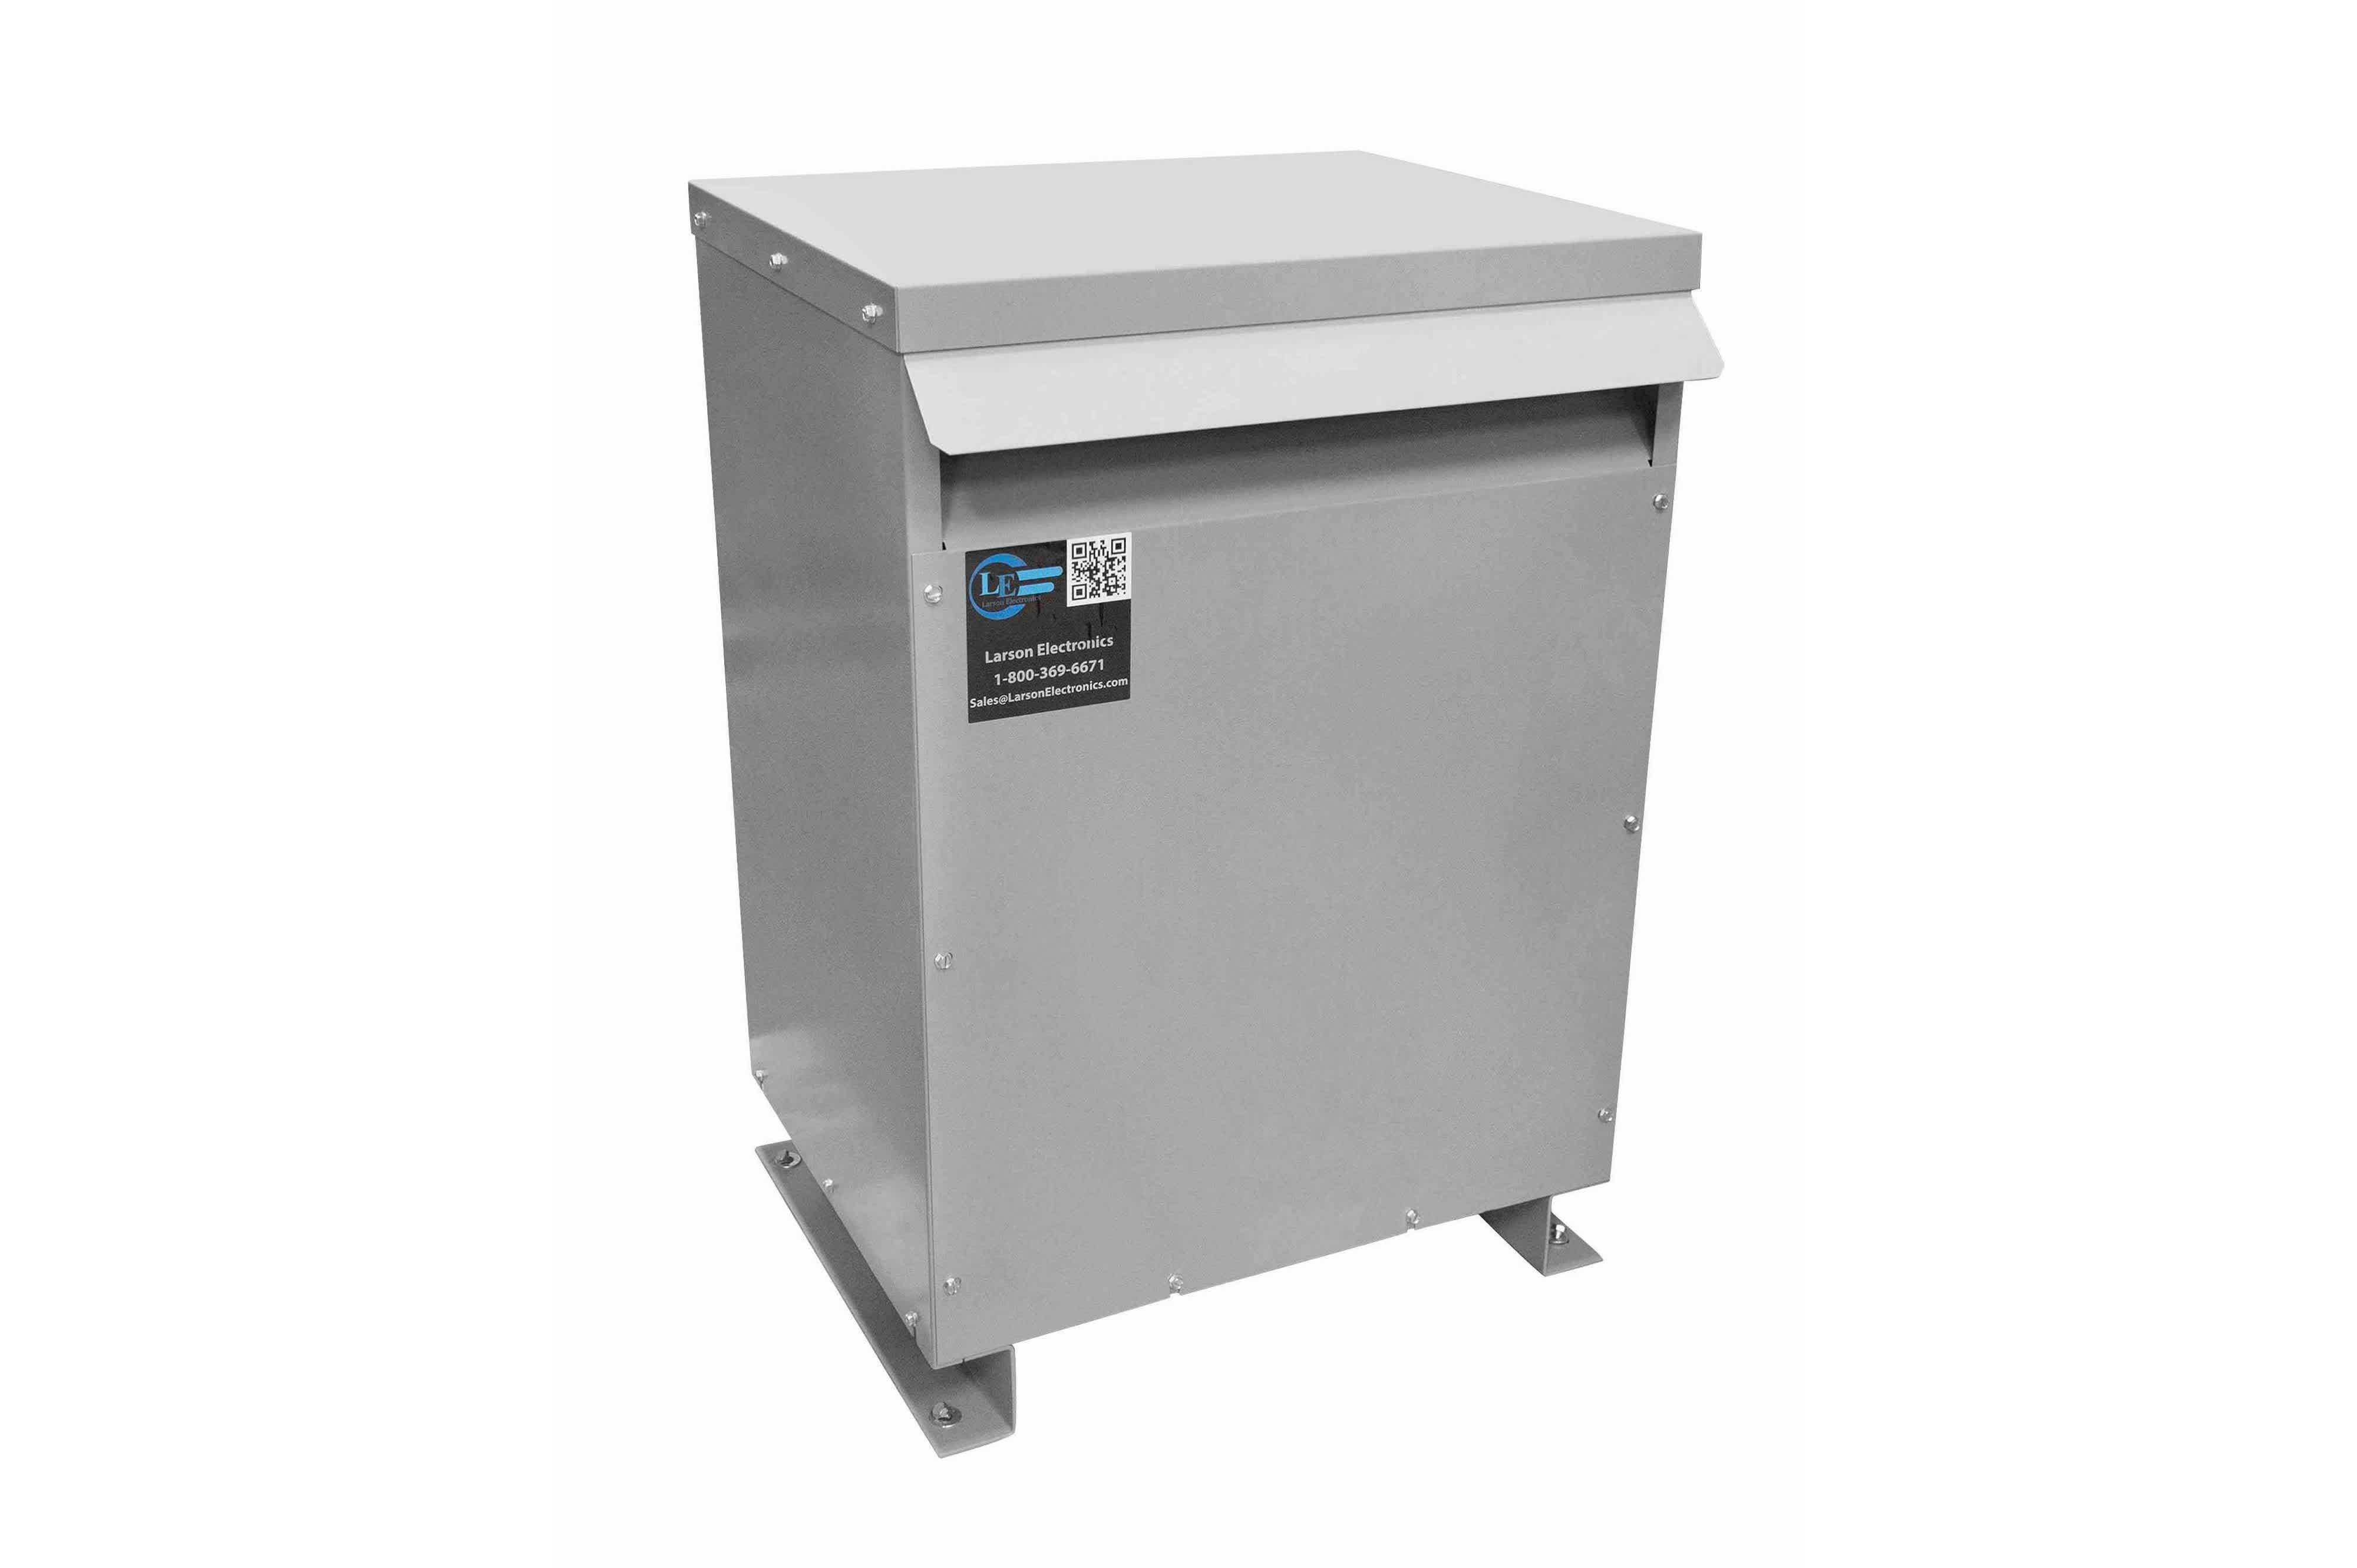 70 kVA 3PH Isolation Transformer, 460V Wye Primary, 415V Delta Secondary, N3R, Ventilated, 60 Hz